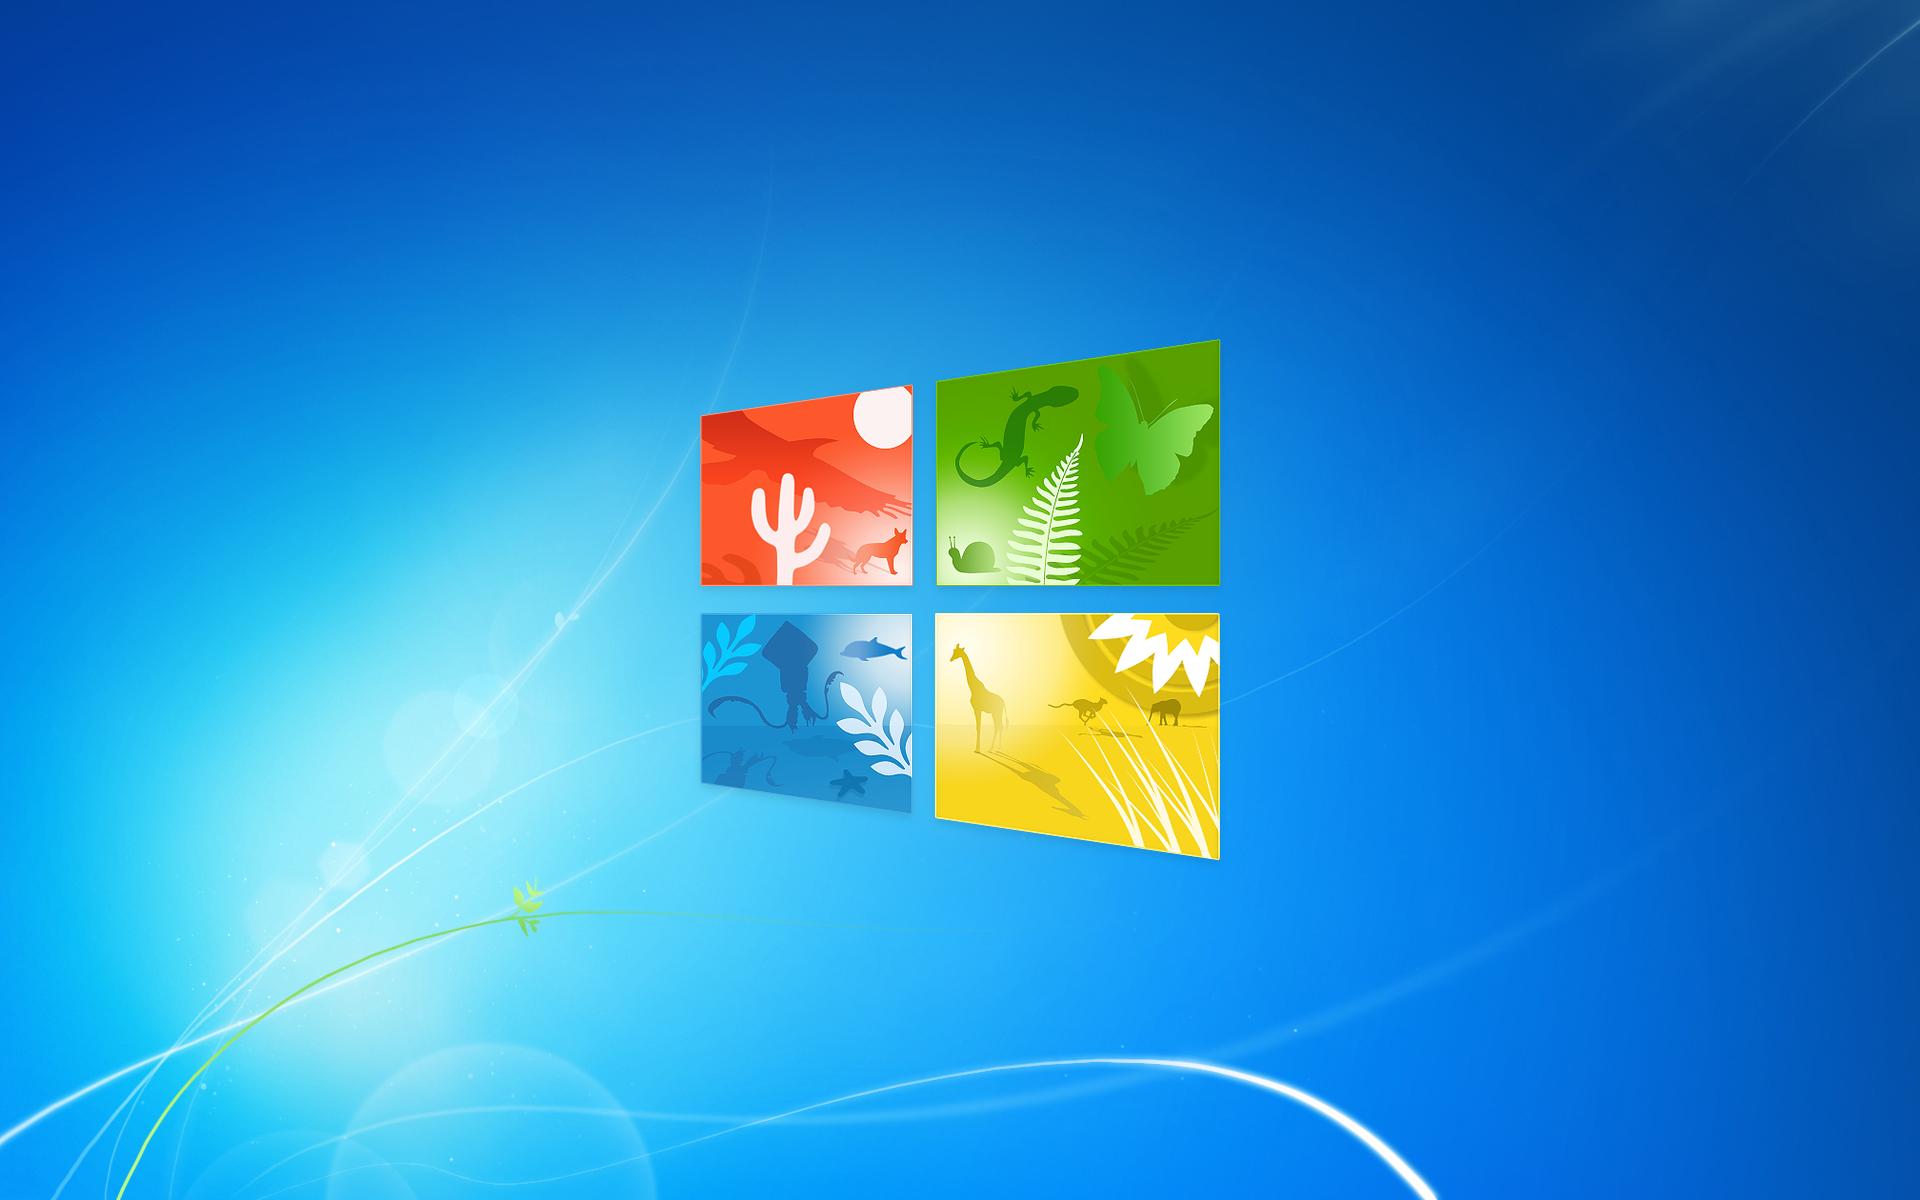 Windows 10 Aero Wallpaper By Pabl0w On Deviantart